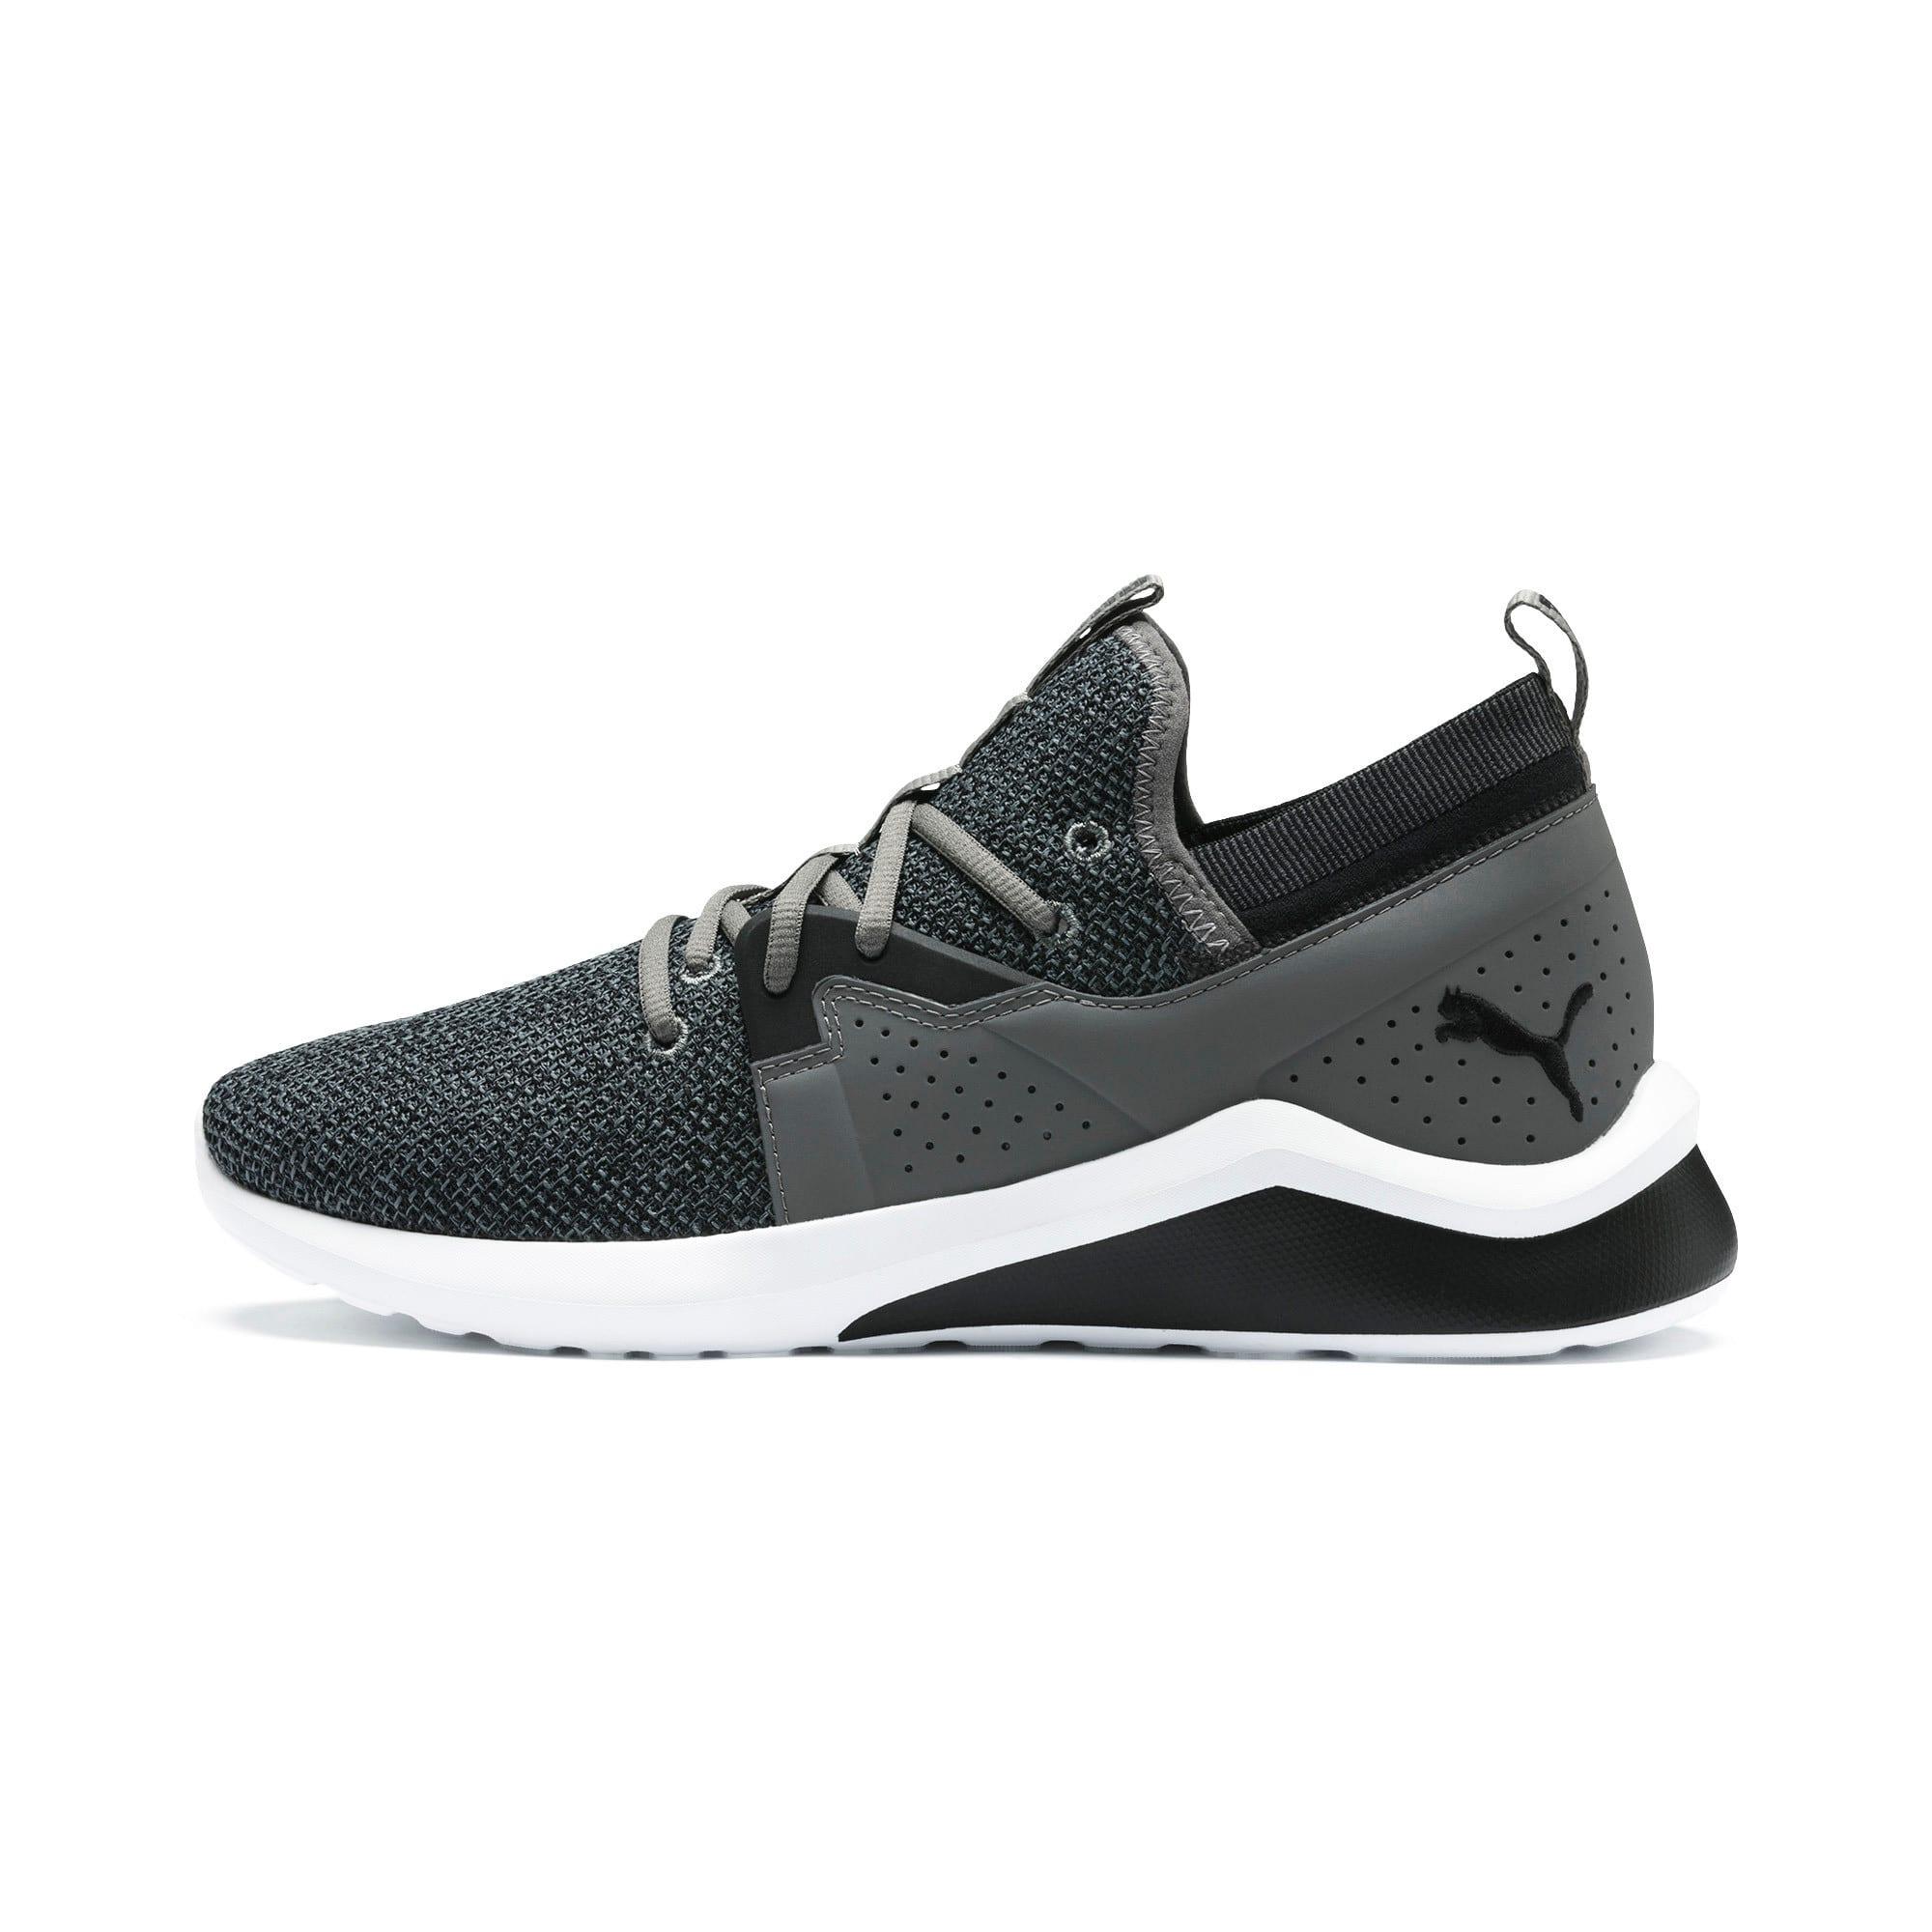 Thumbnail 1 of Emergence Men's Running Shoes, CASTLEROCK-Puma Black, medium-IND